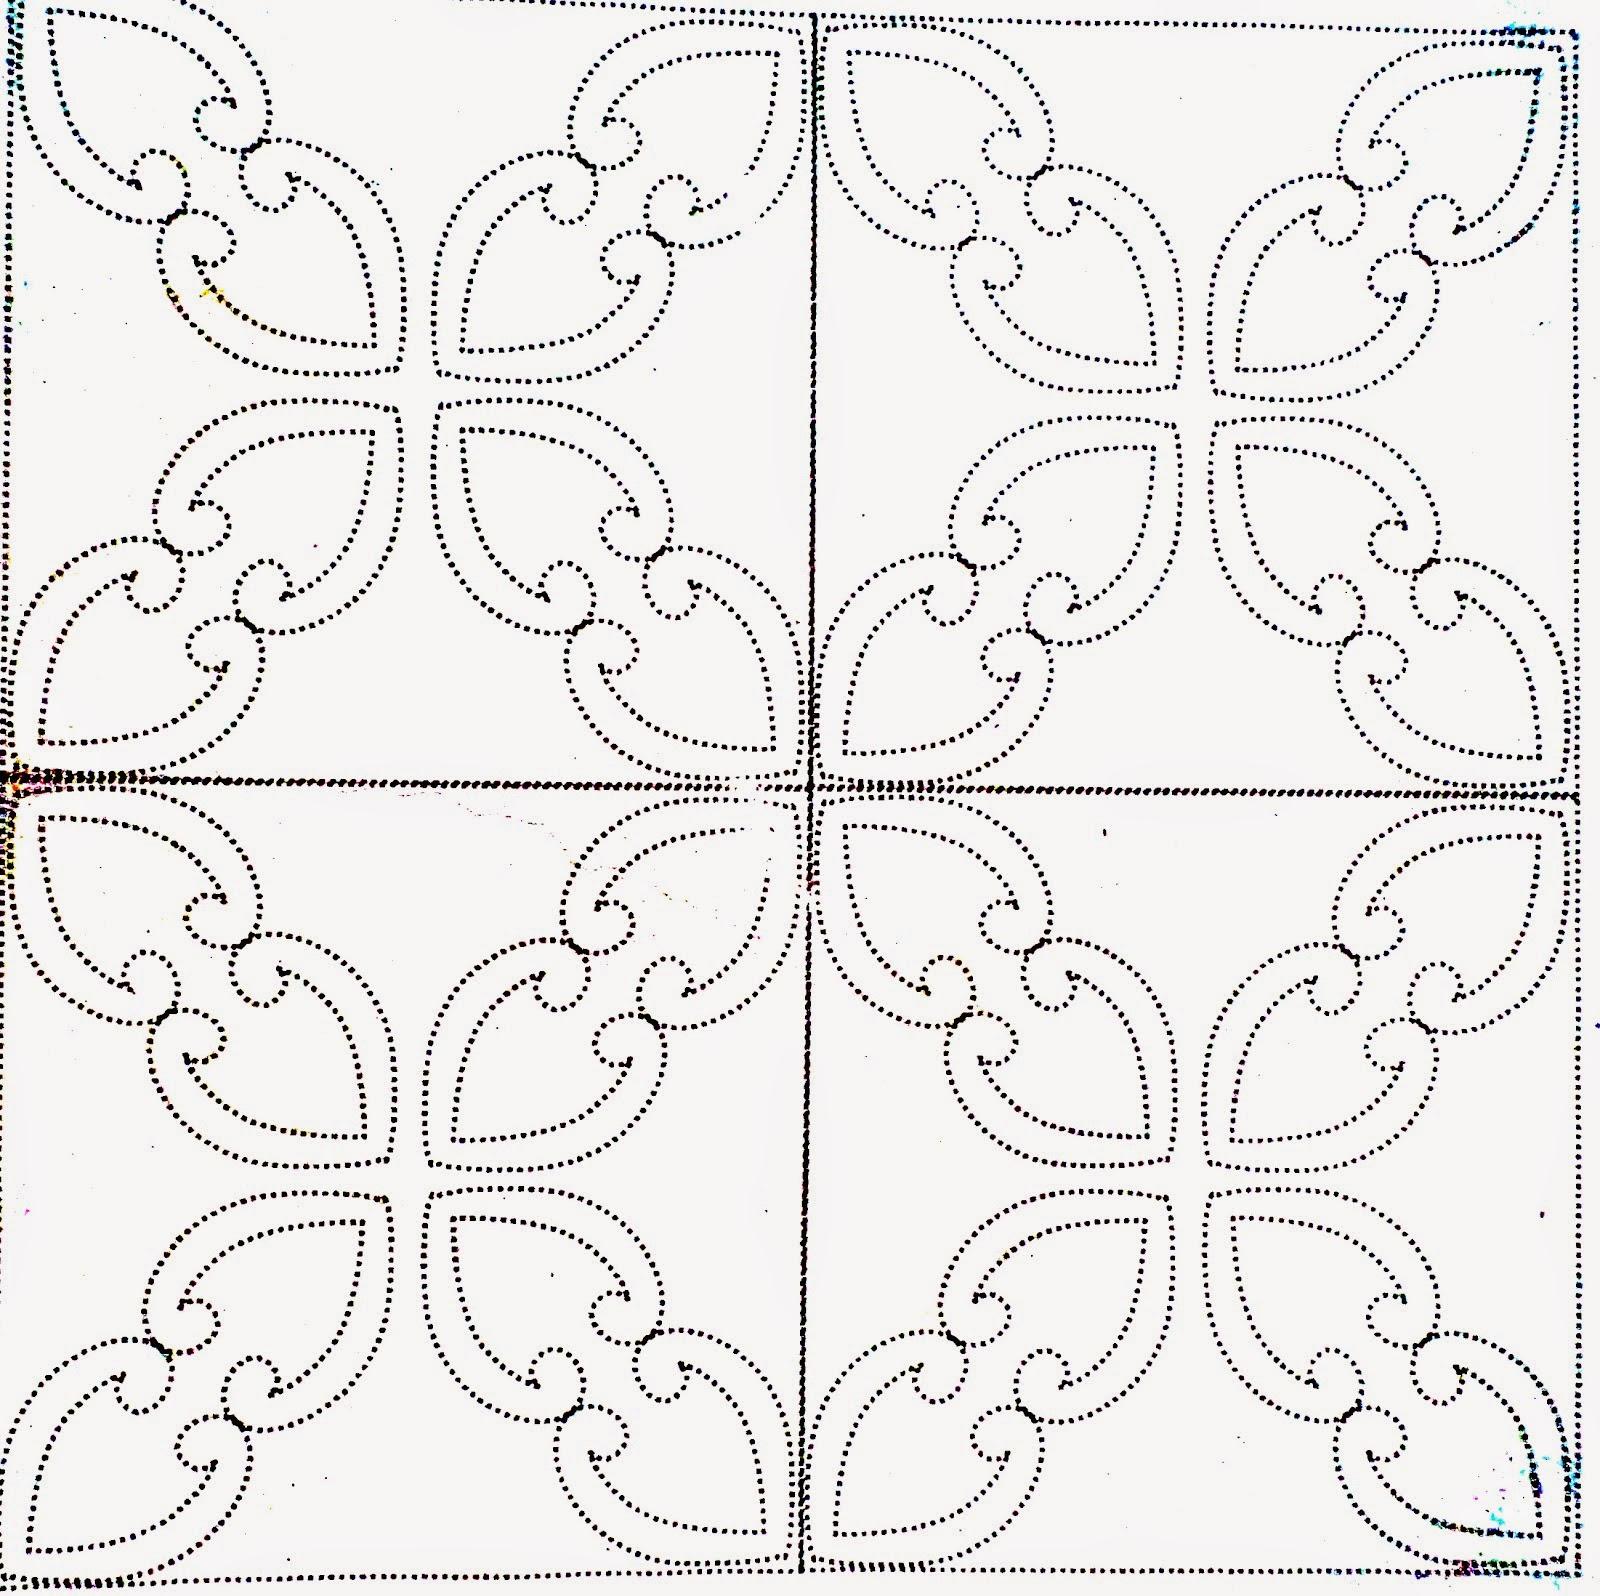 Gambar Batik Motif Geometris